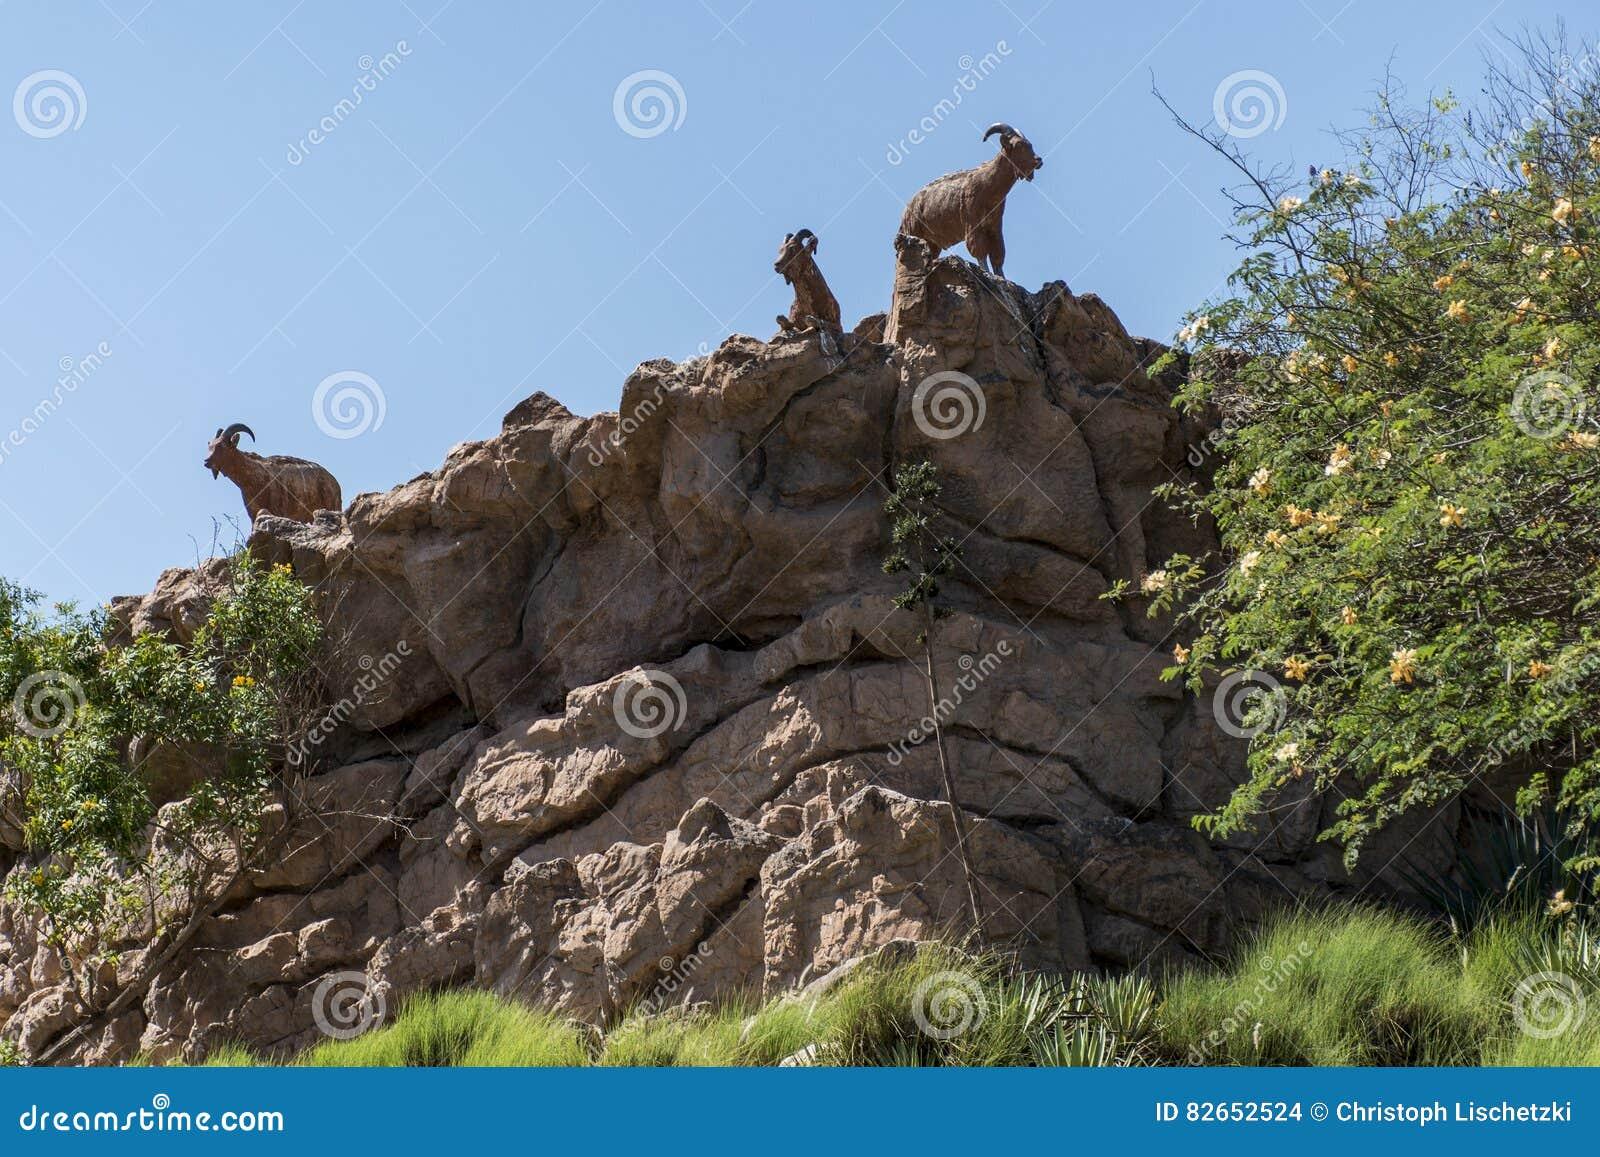 Goat at edge of a mountain in Oman salalah dhofar region 2